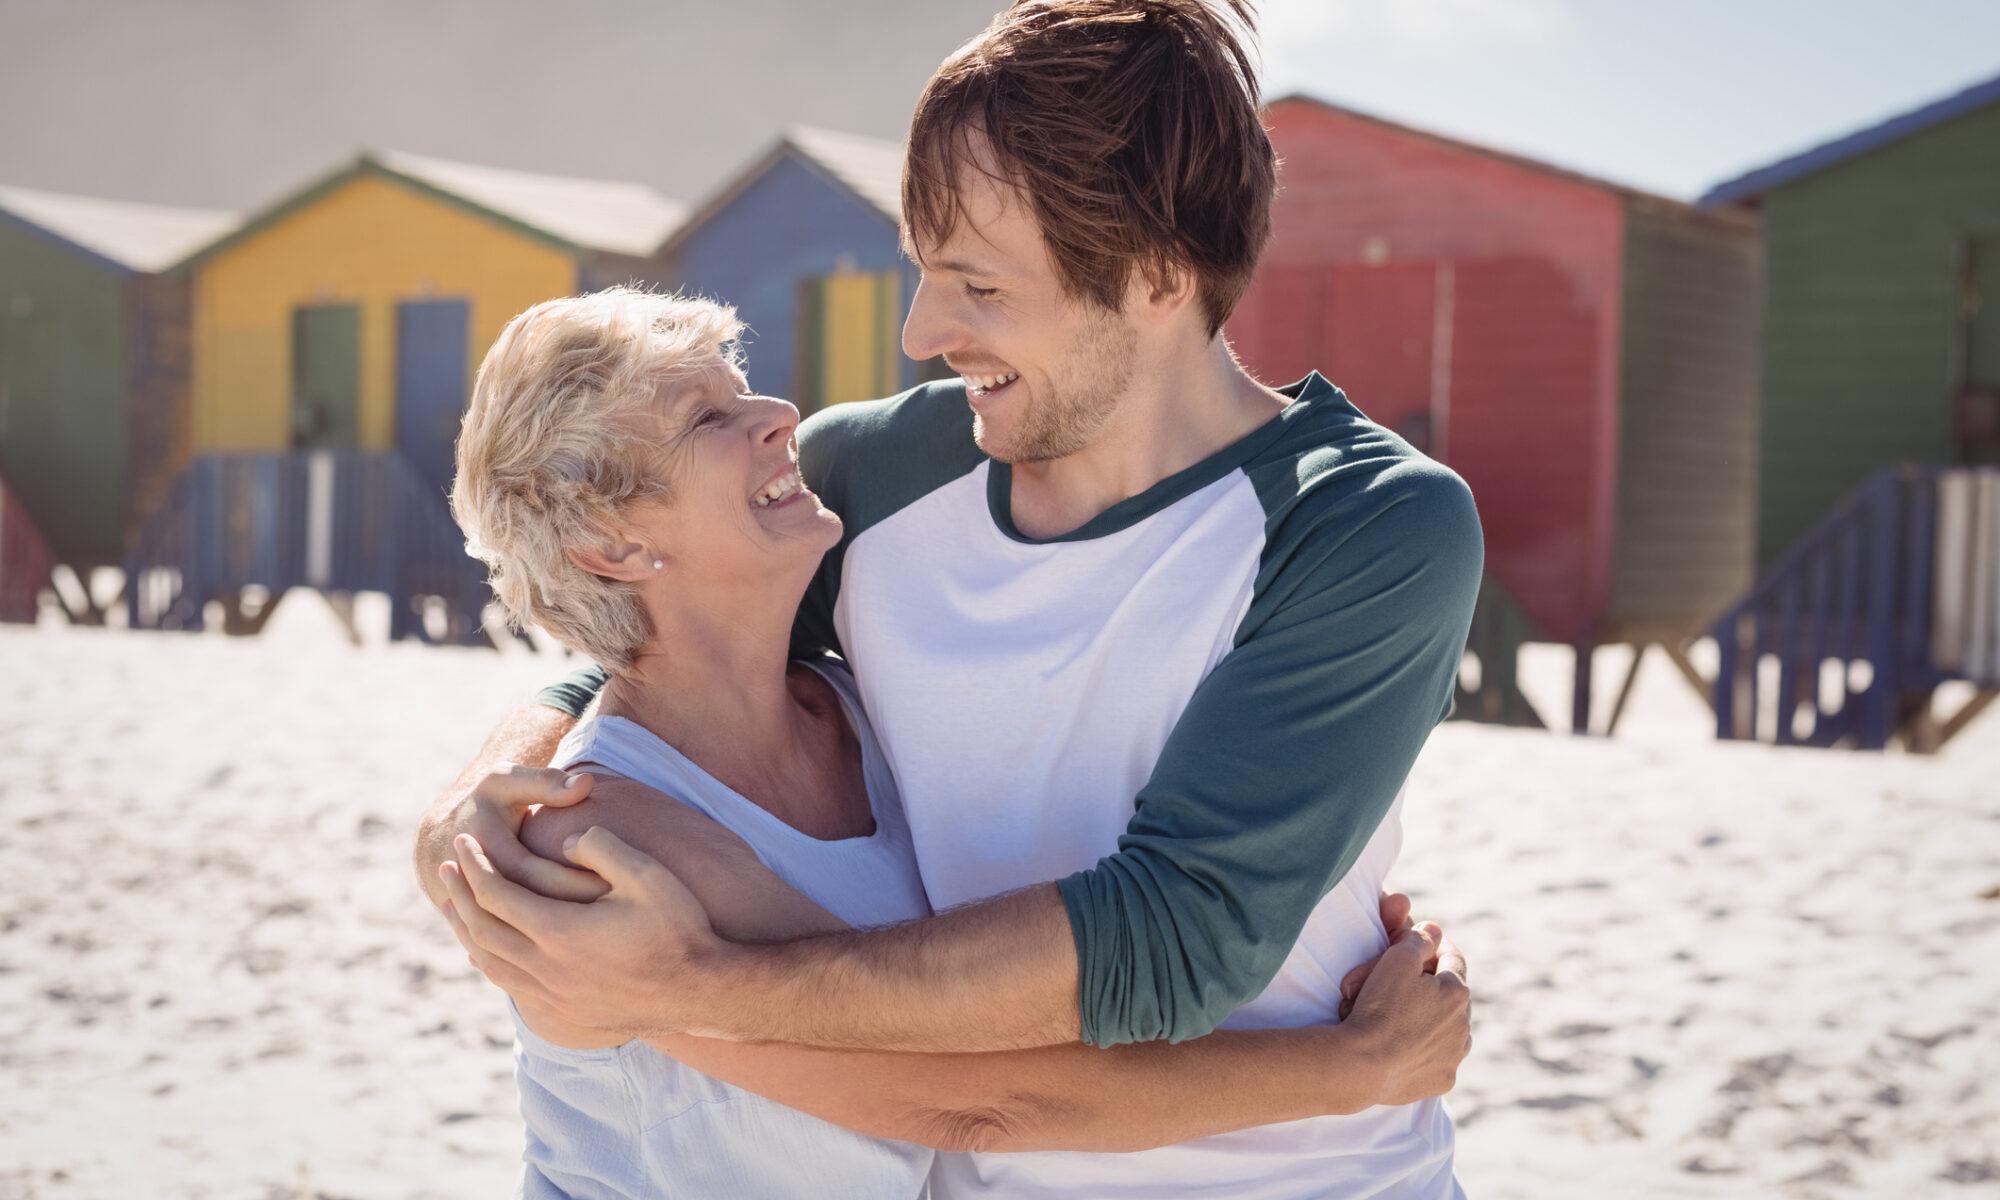 Altersunterschie, junger Mann mit älterer Frau am Strand